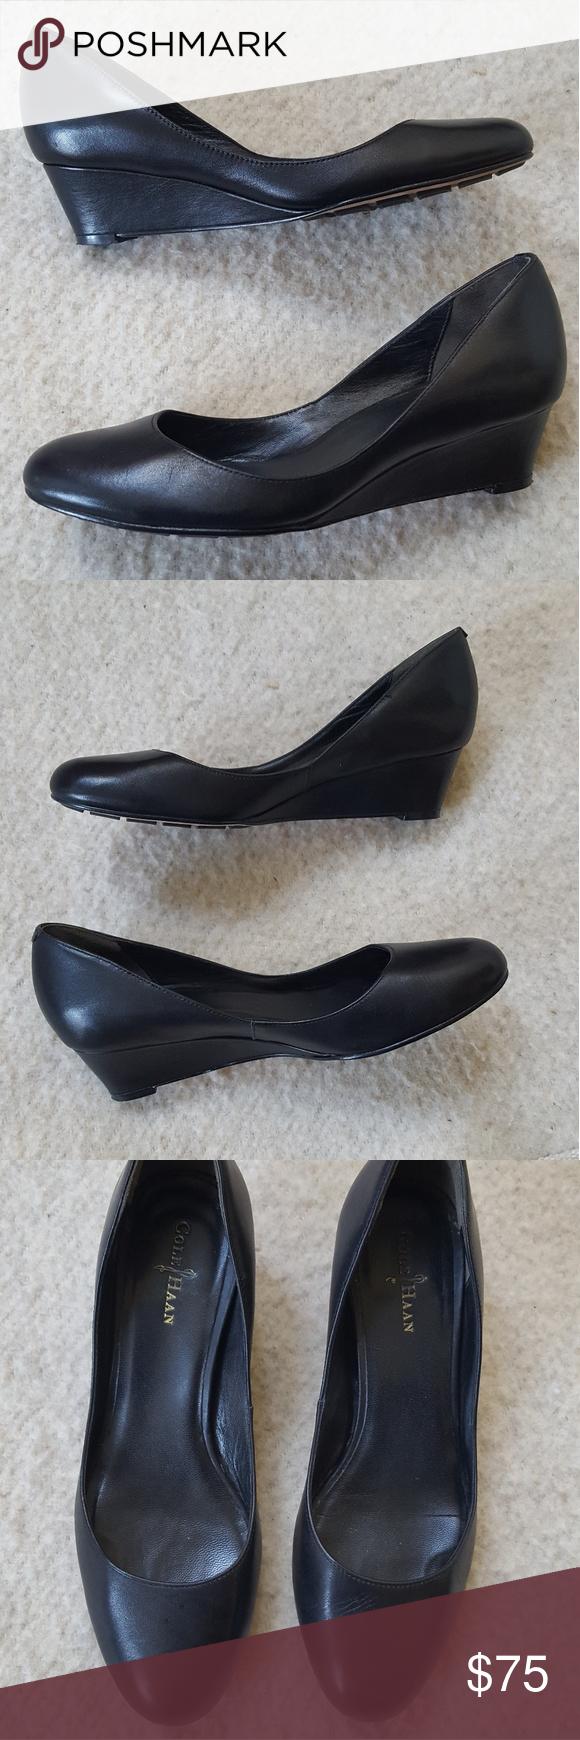 65709fa1339 Cole Haan Nike Air // Tali Wedge Cole Haan / Nike Air Tali Wedge Size: 6B  Cole Haan Shoes Wedges